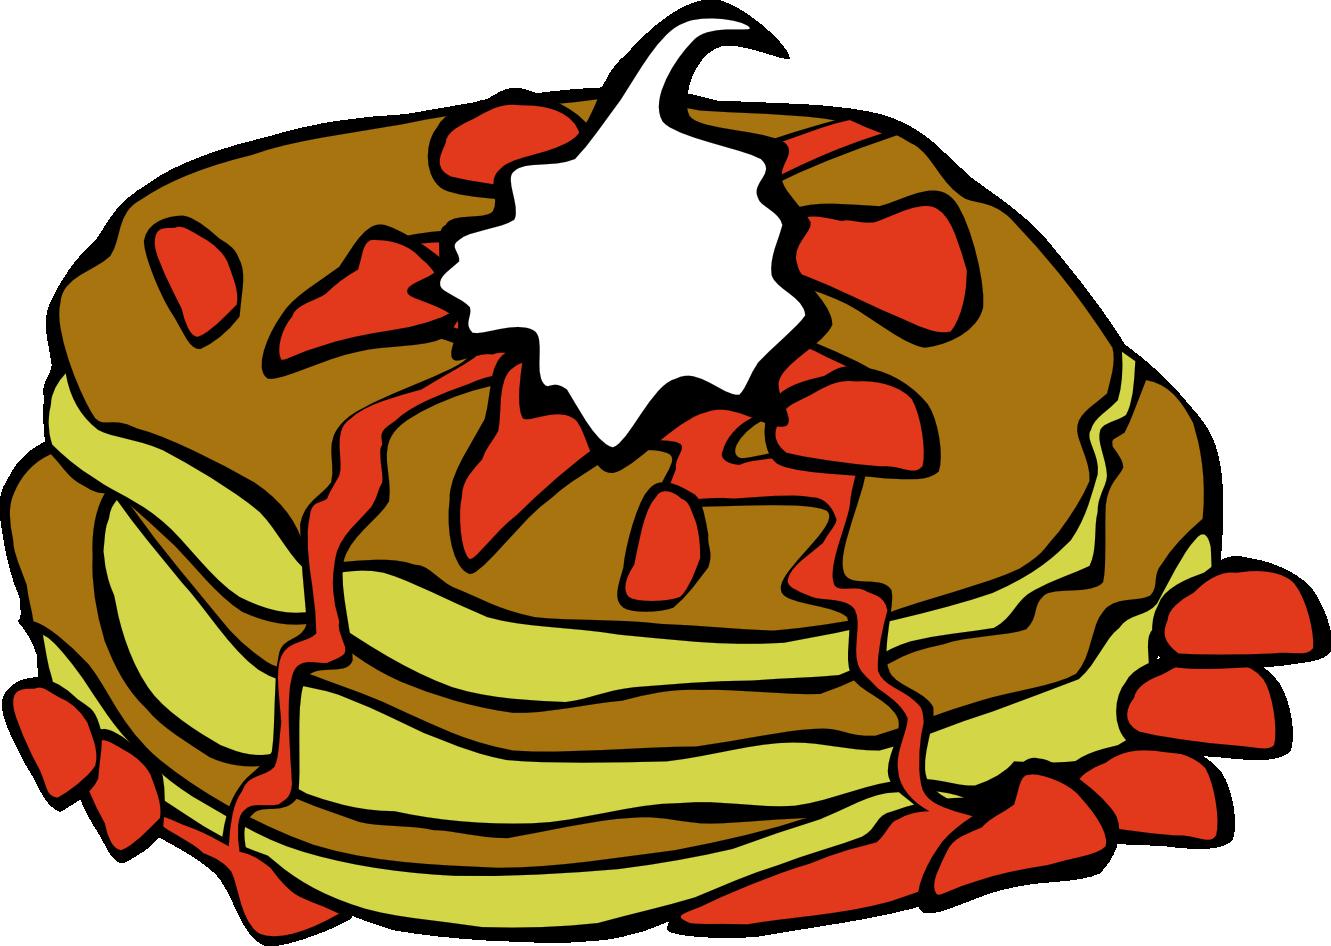 clipart transparent download Most interesting eat breakfast. Brunch clipart cartoon.